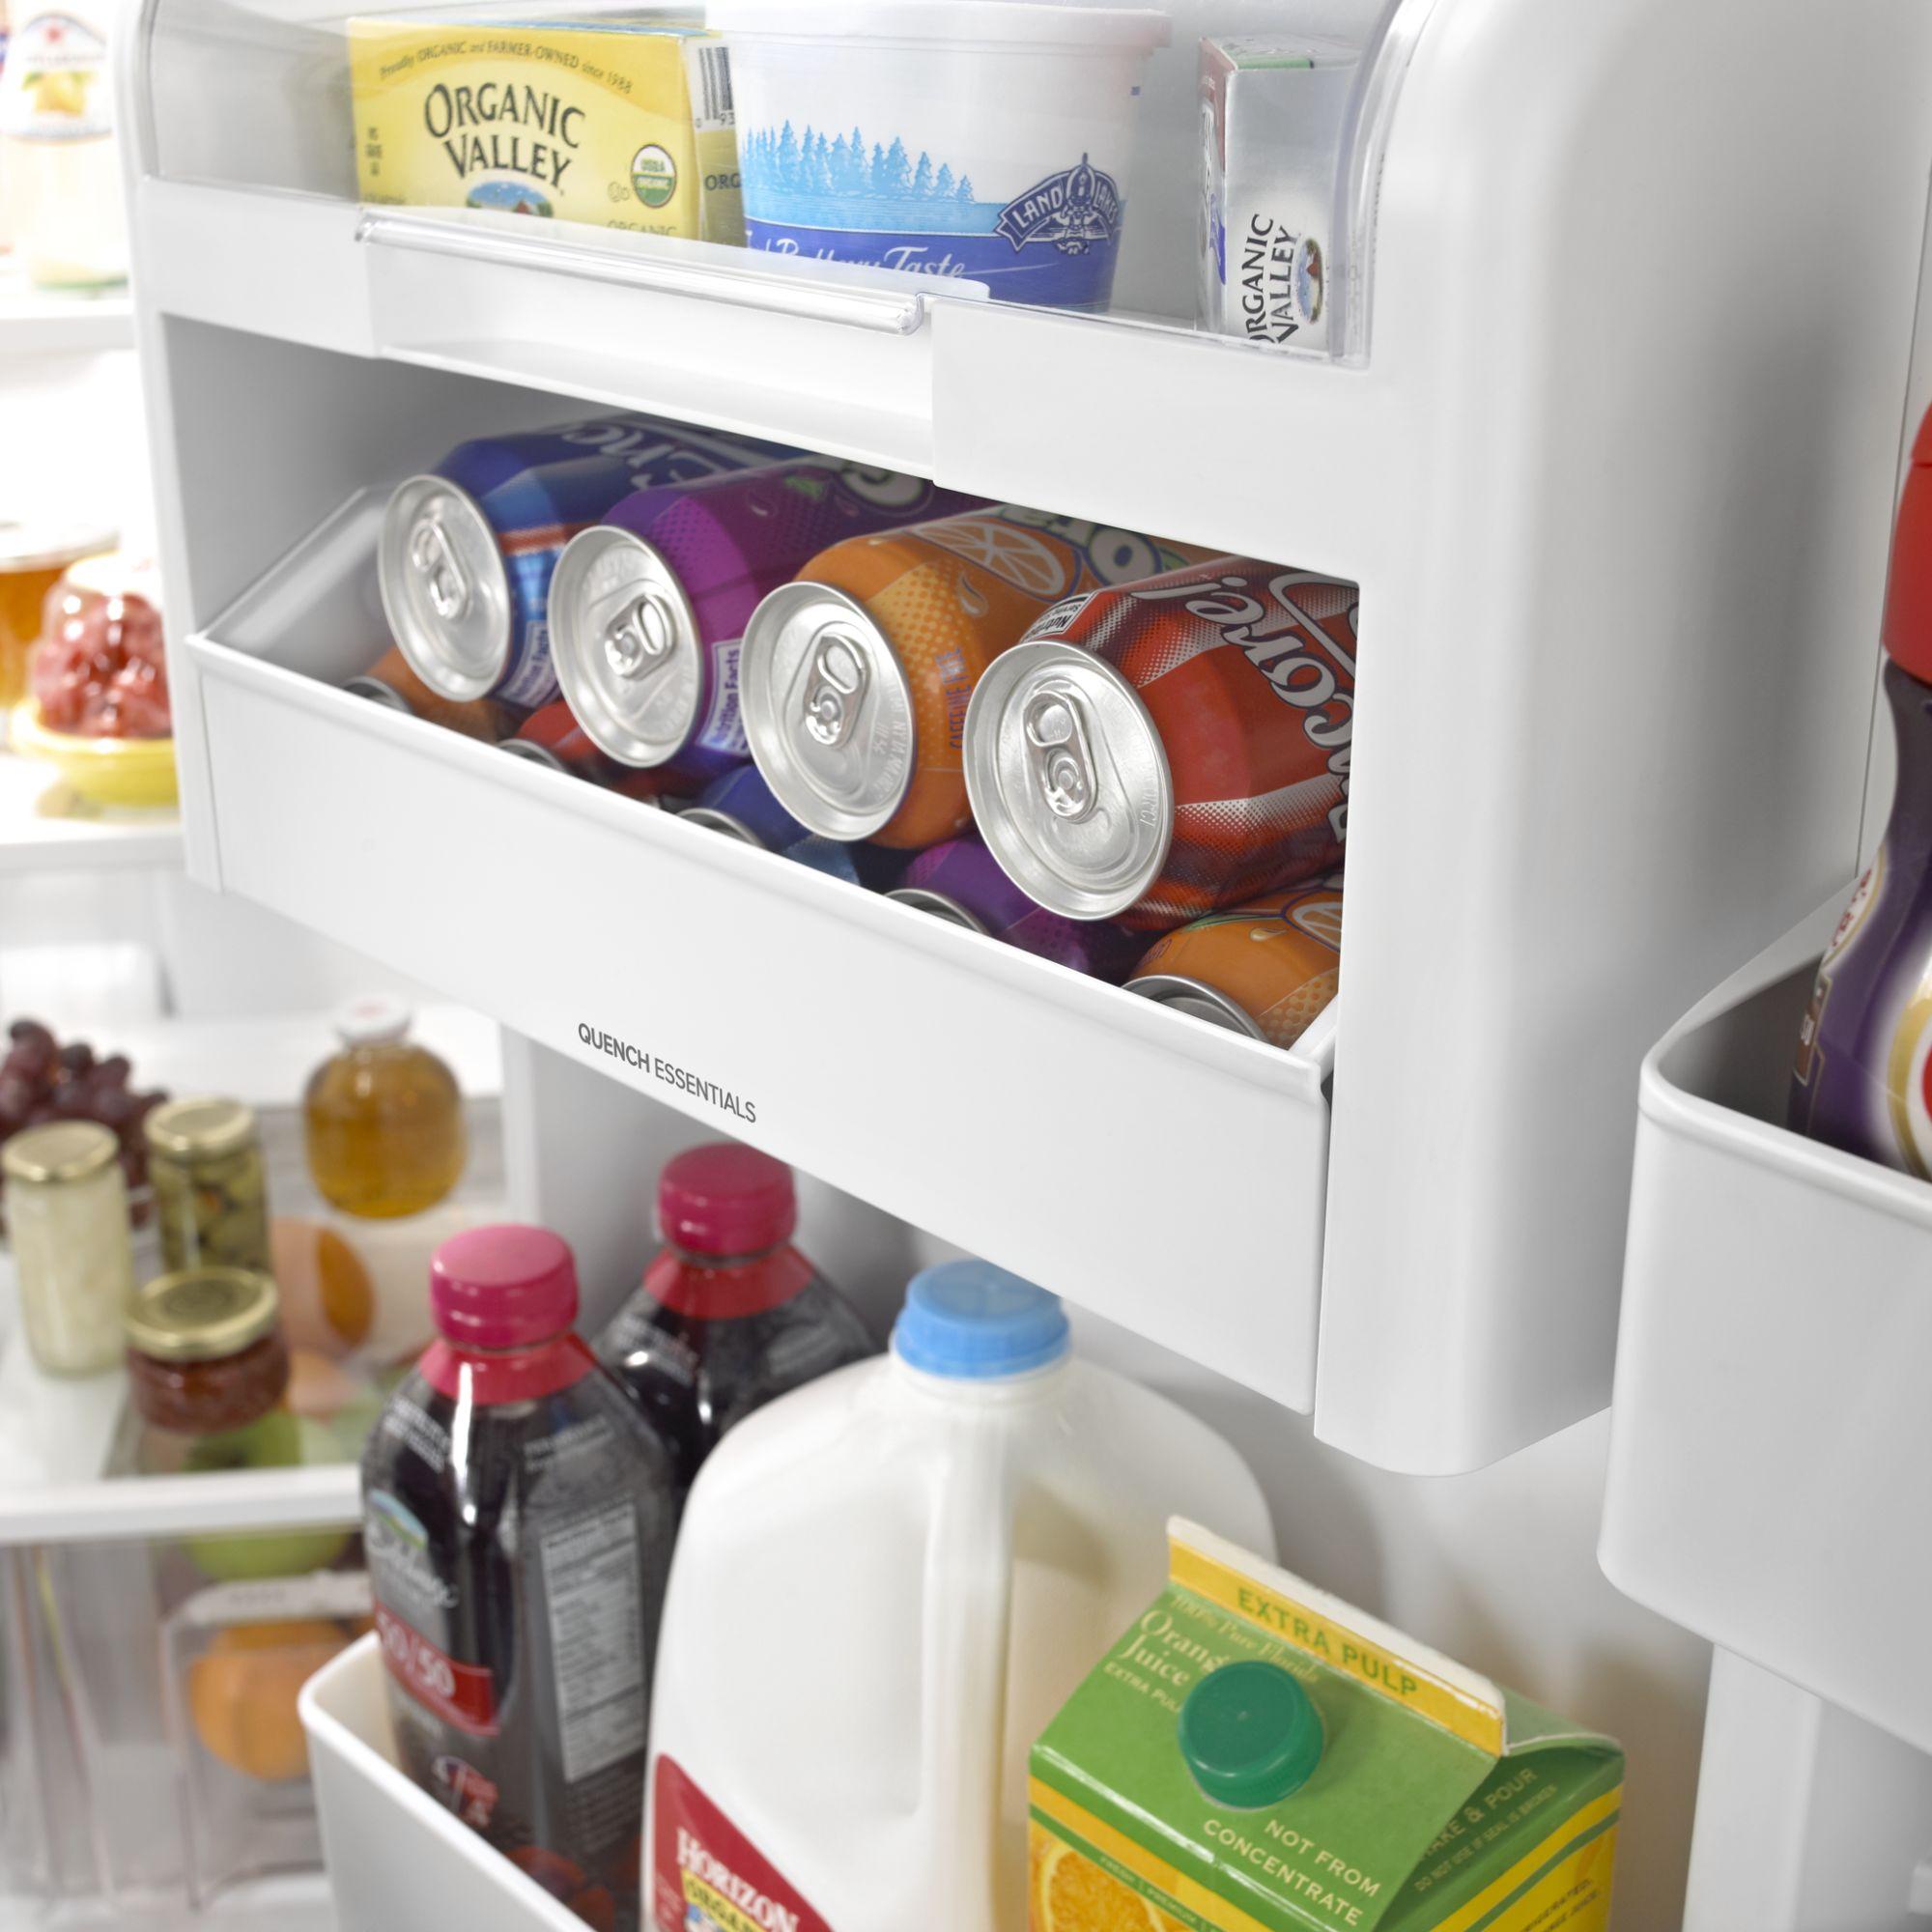 Amana 21 cu. ft. Top-Freezer Refrigerator - Black